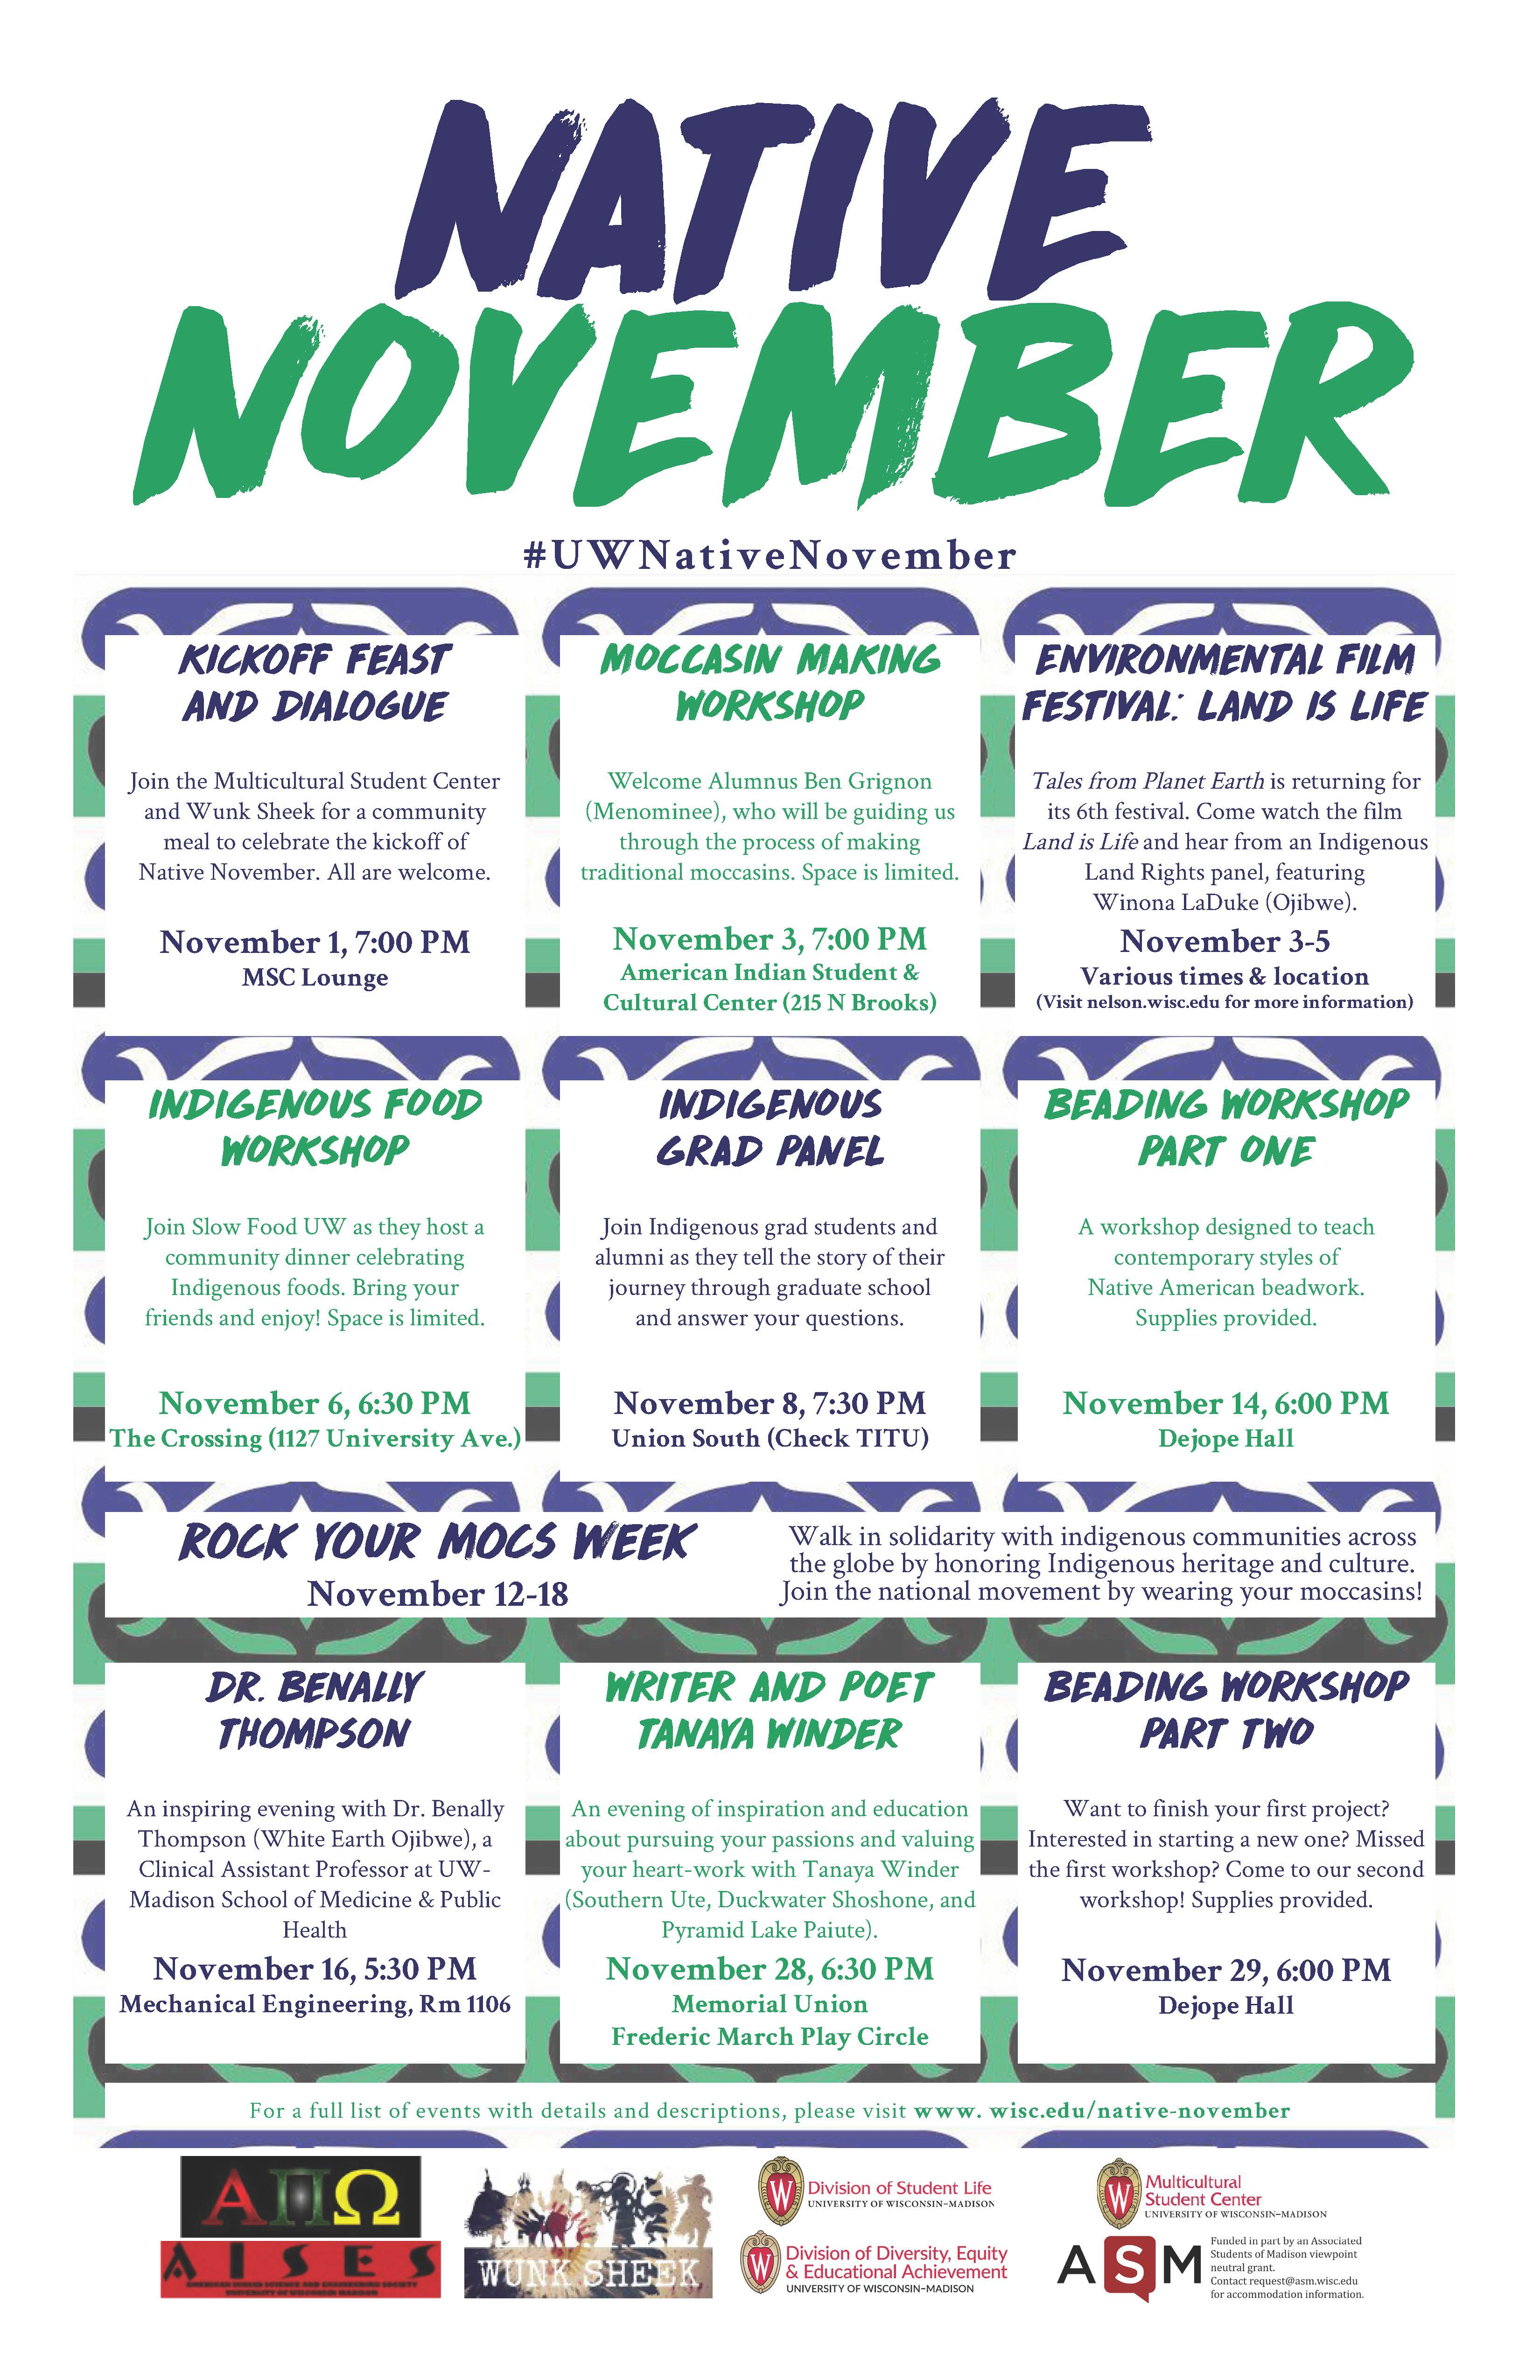 Native November calendar